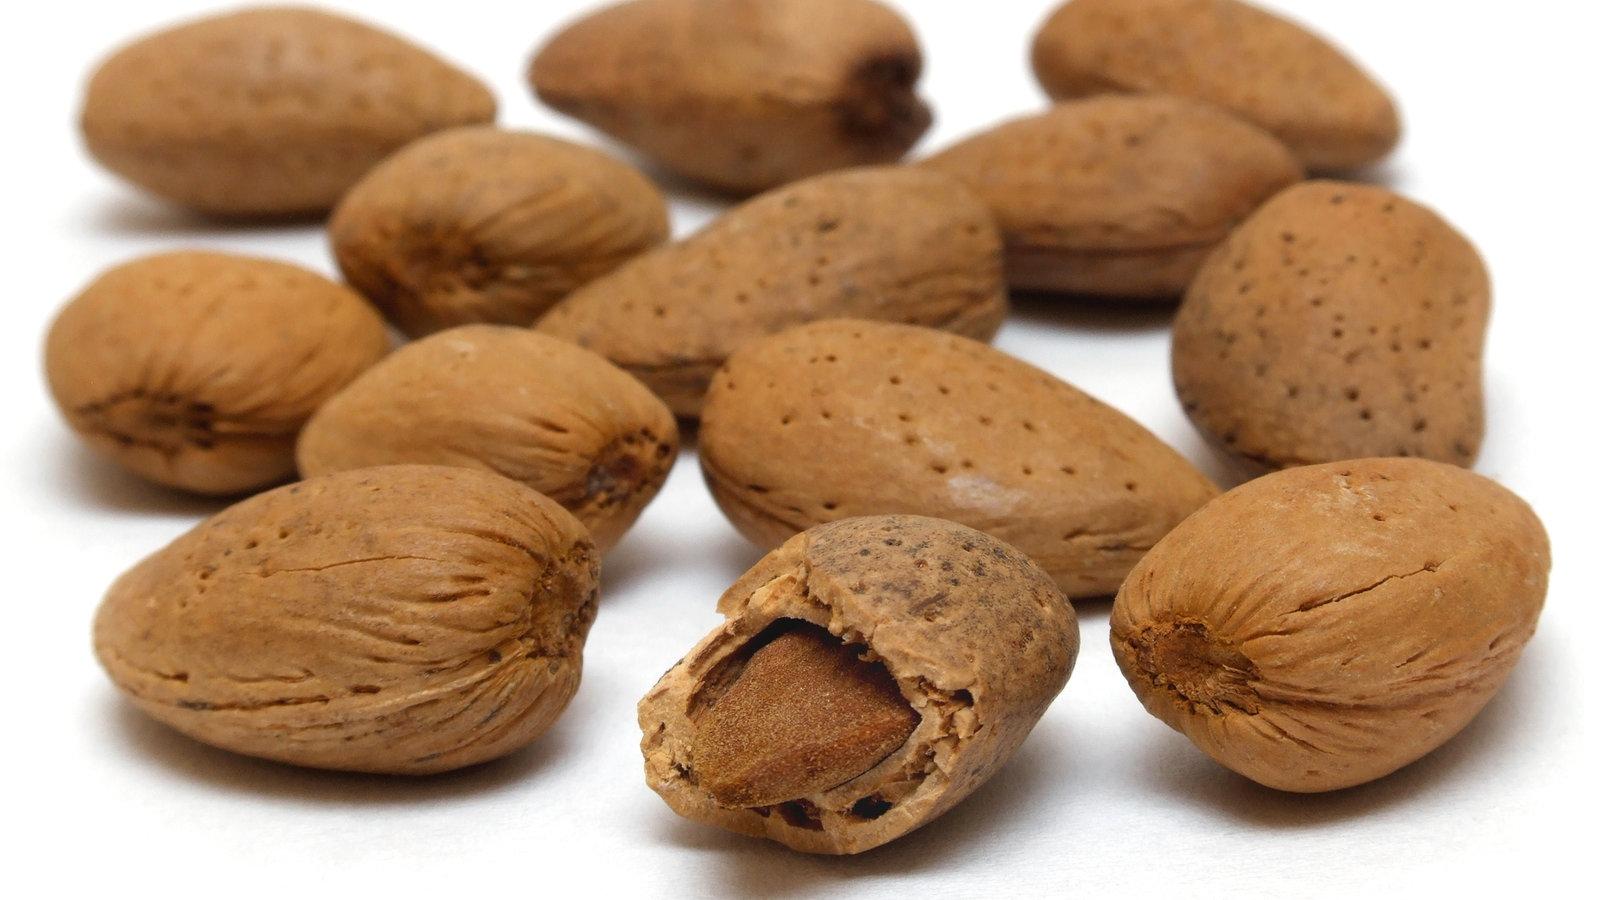 Nusse Nussarten Nusse Lebensmittel Gesellschaft Planet Wissen